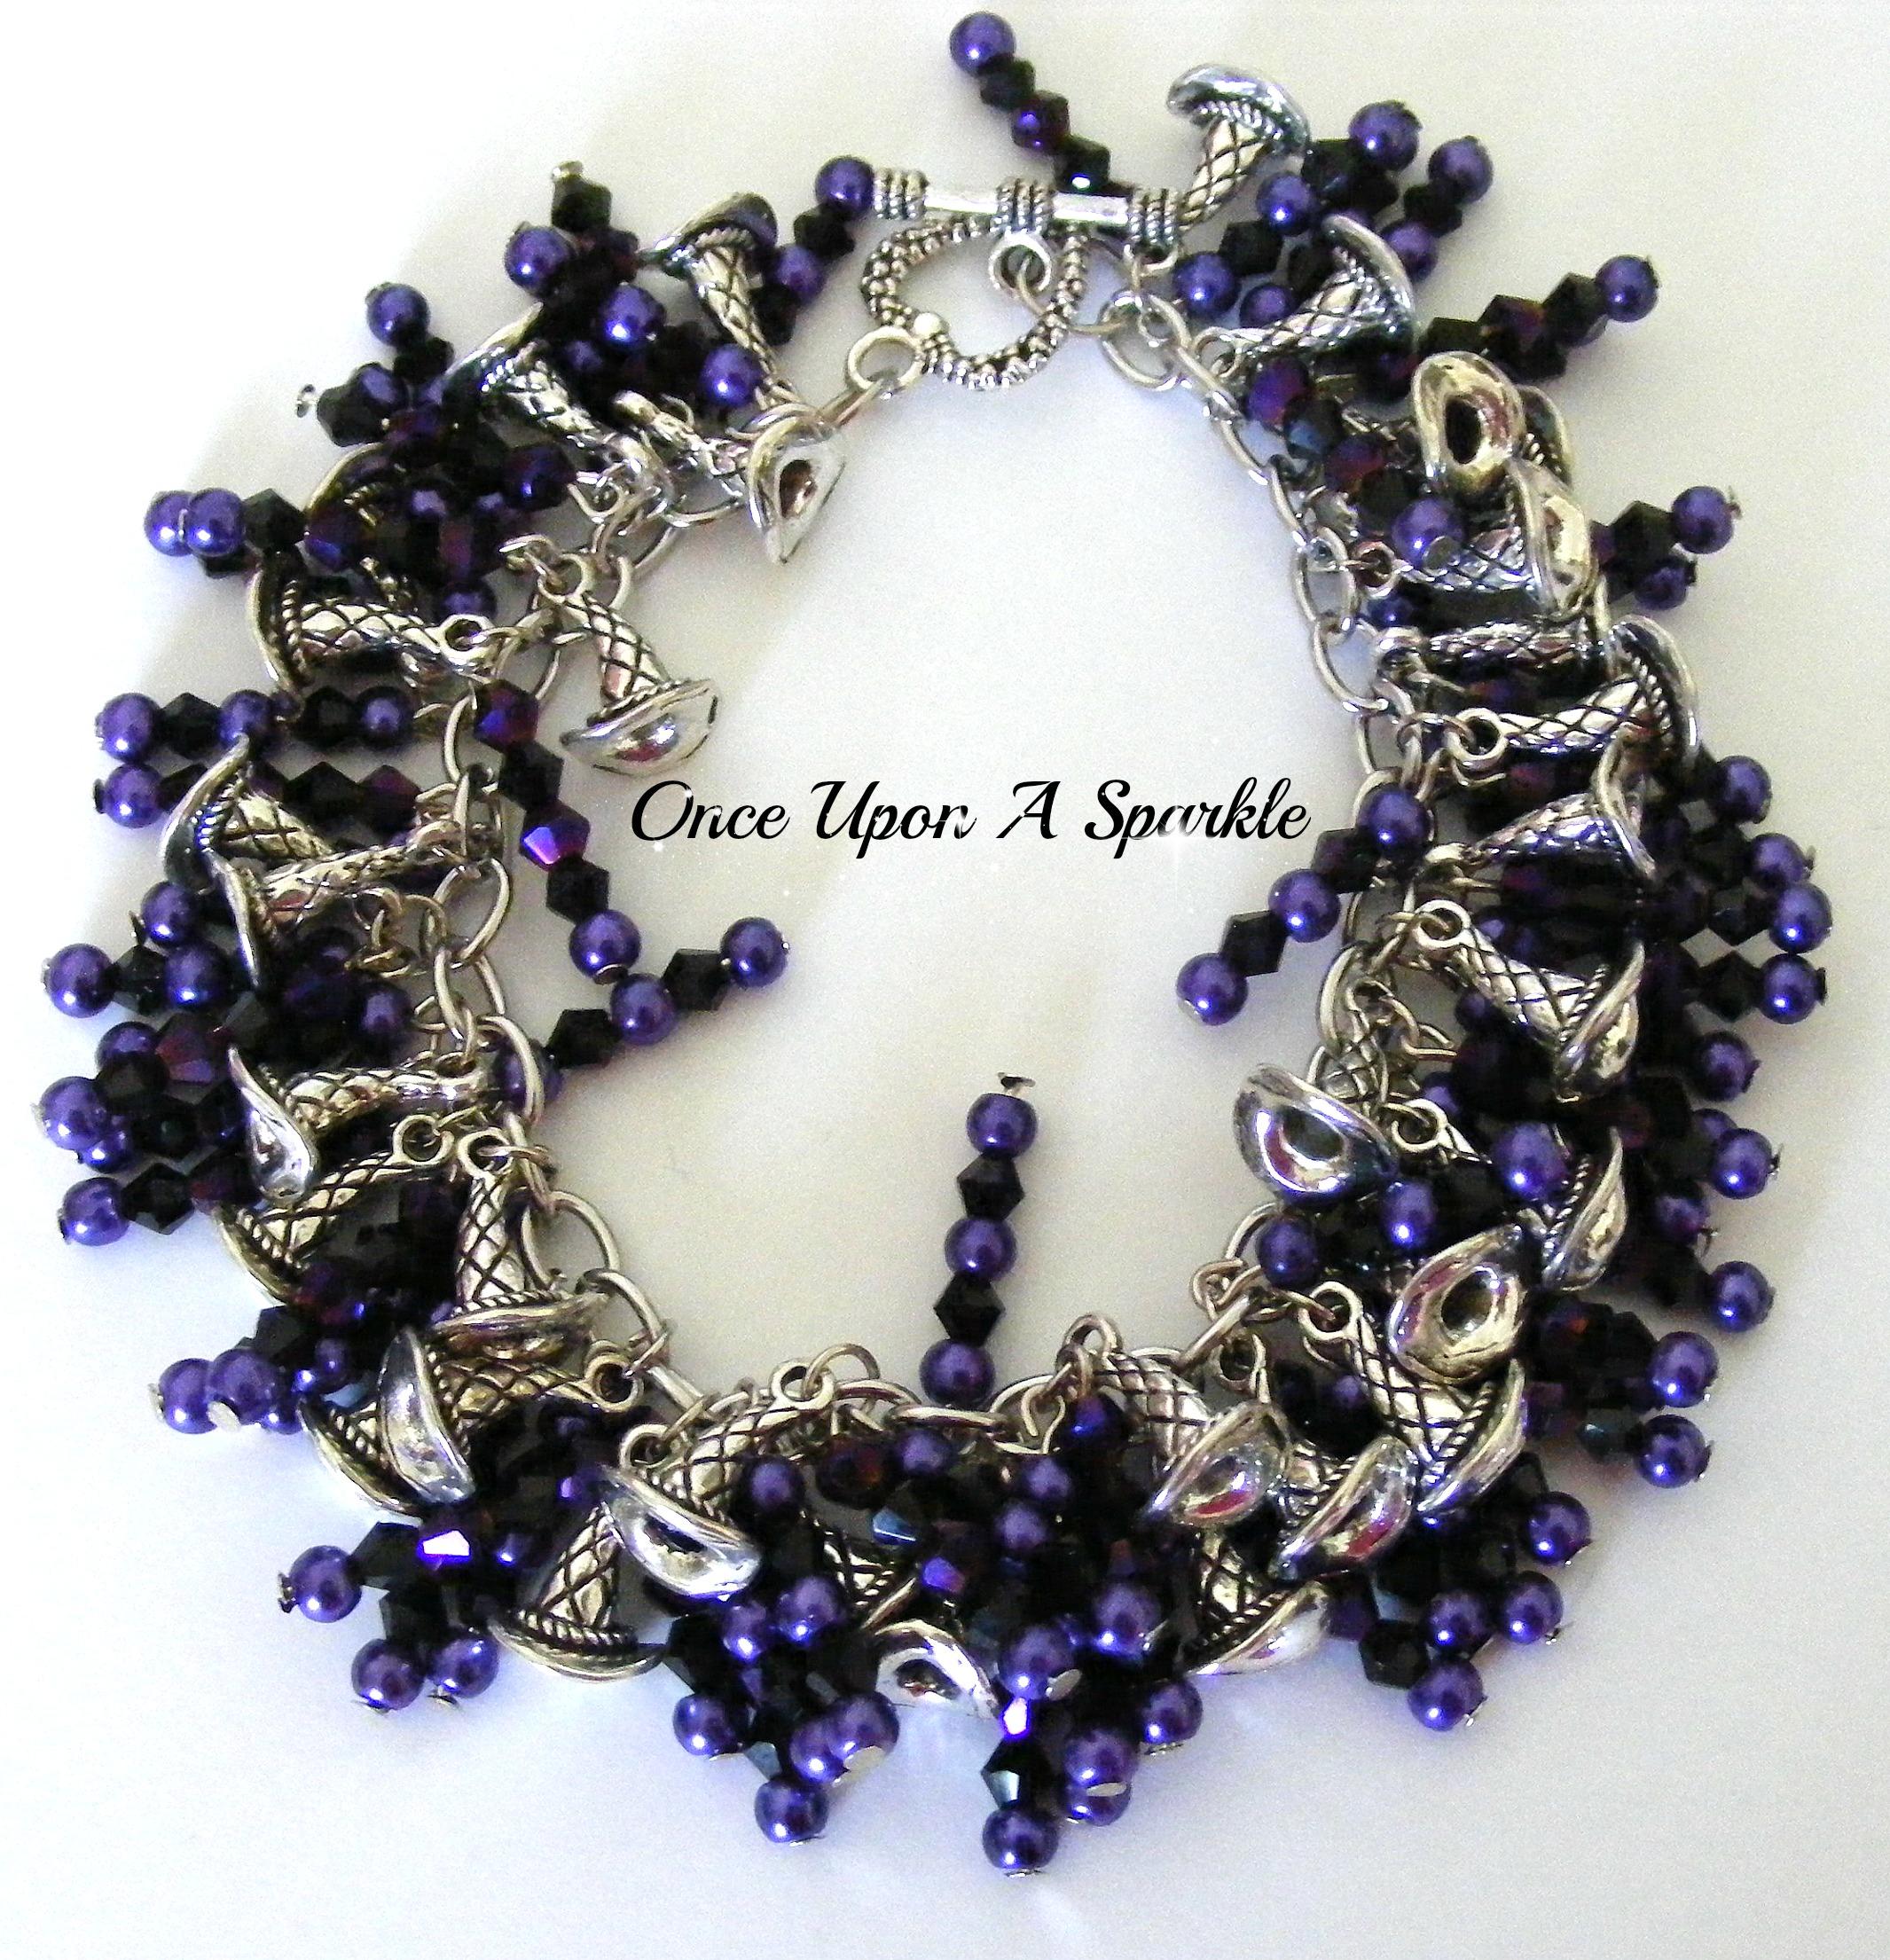 Once Upon A Sparkle Handmade by Jenn